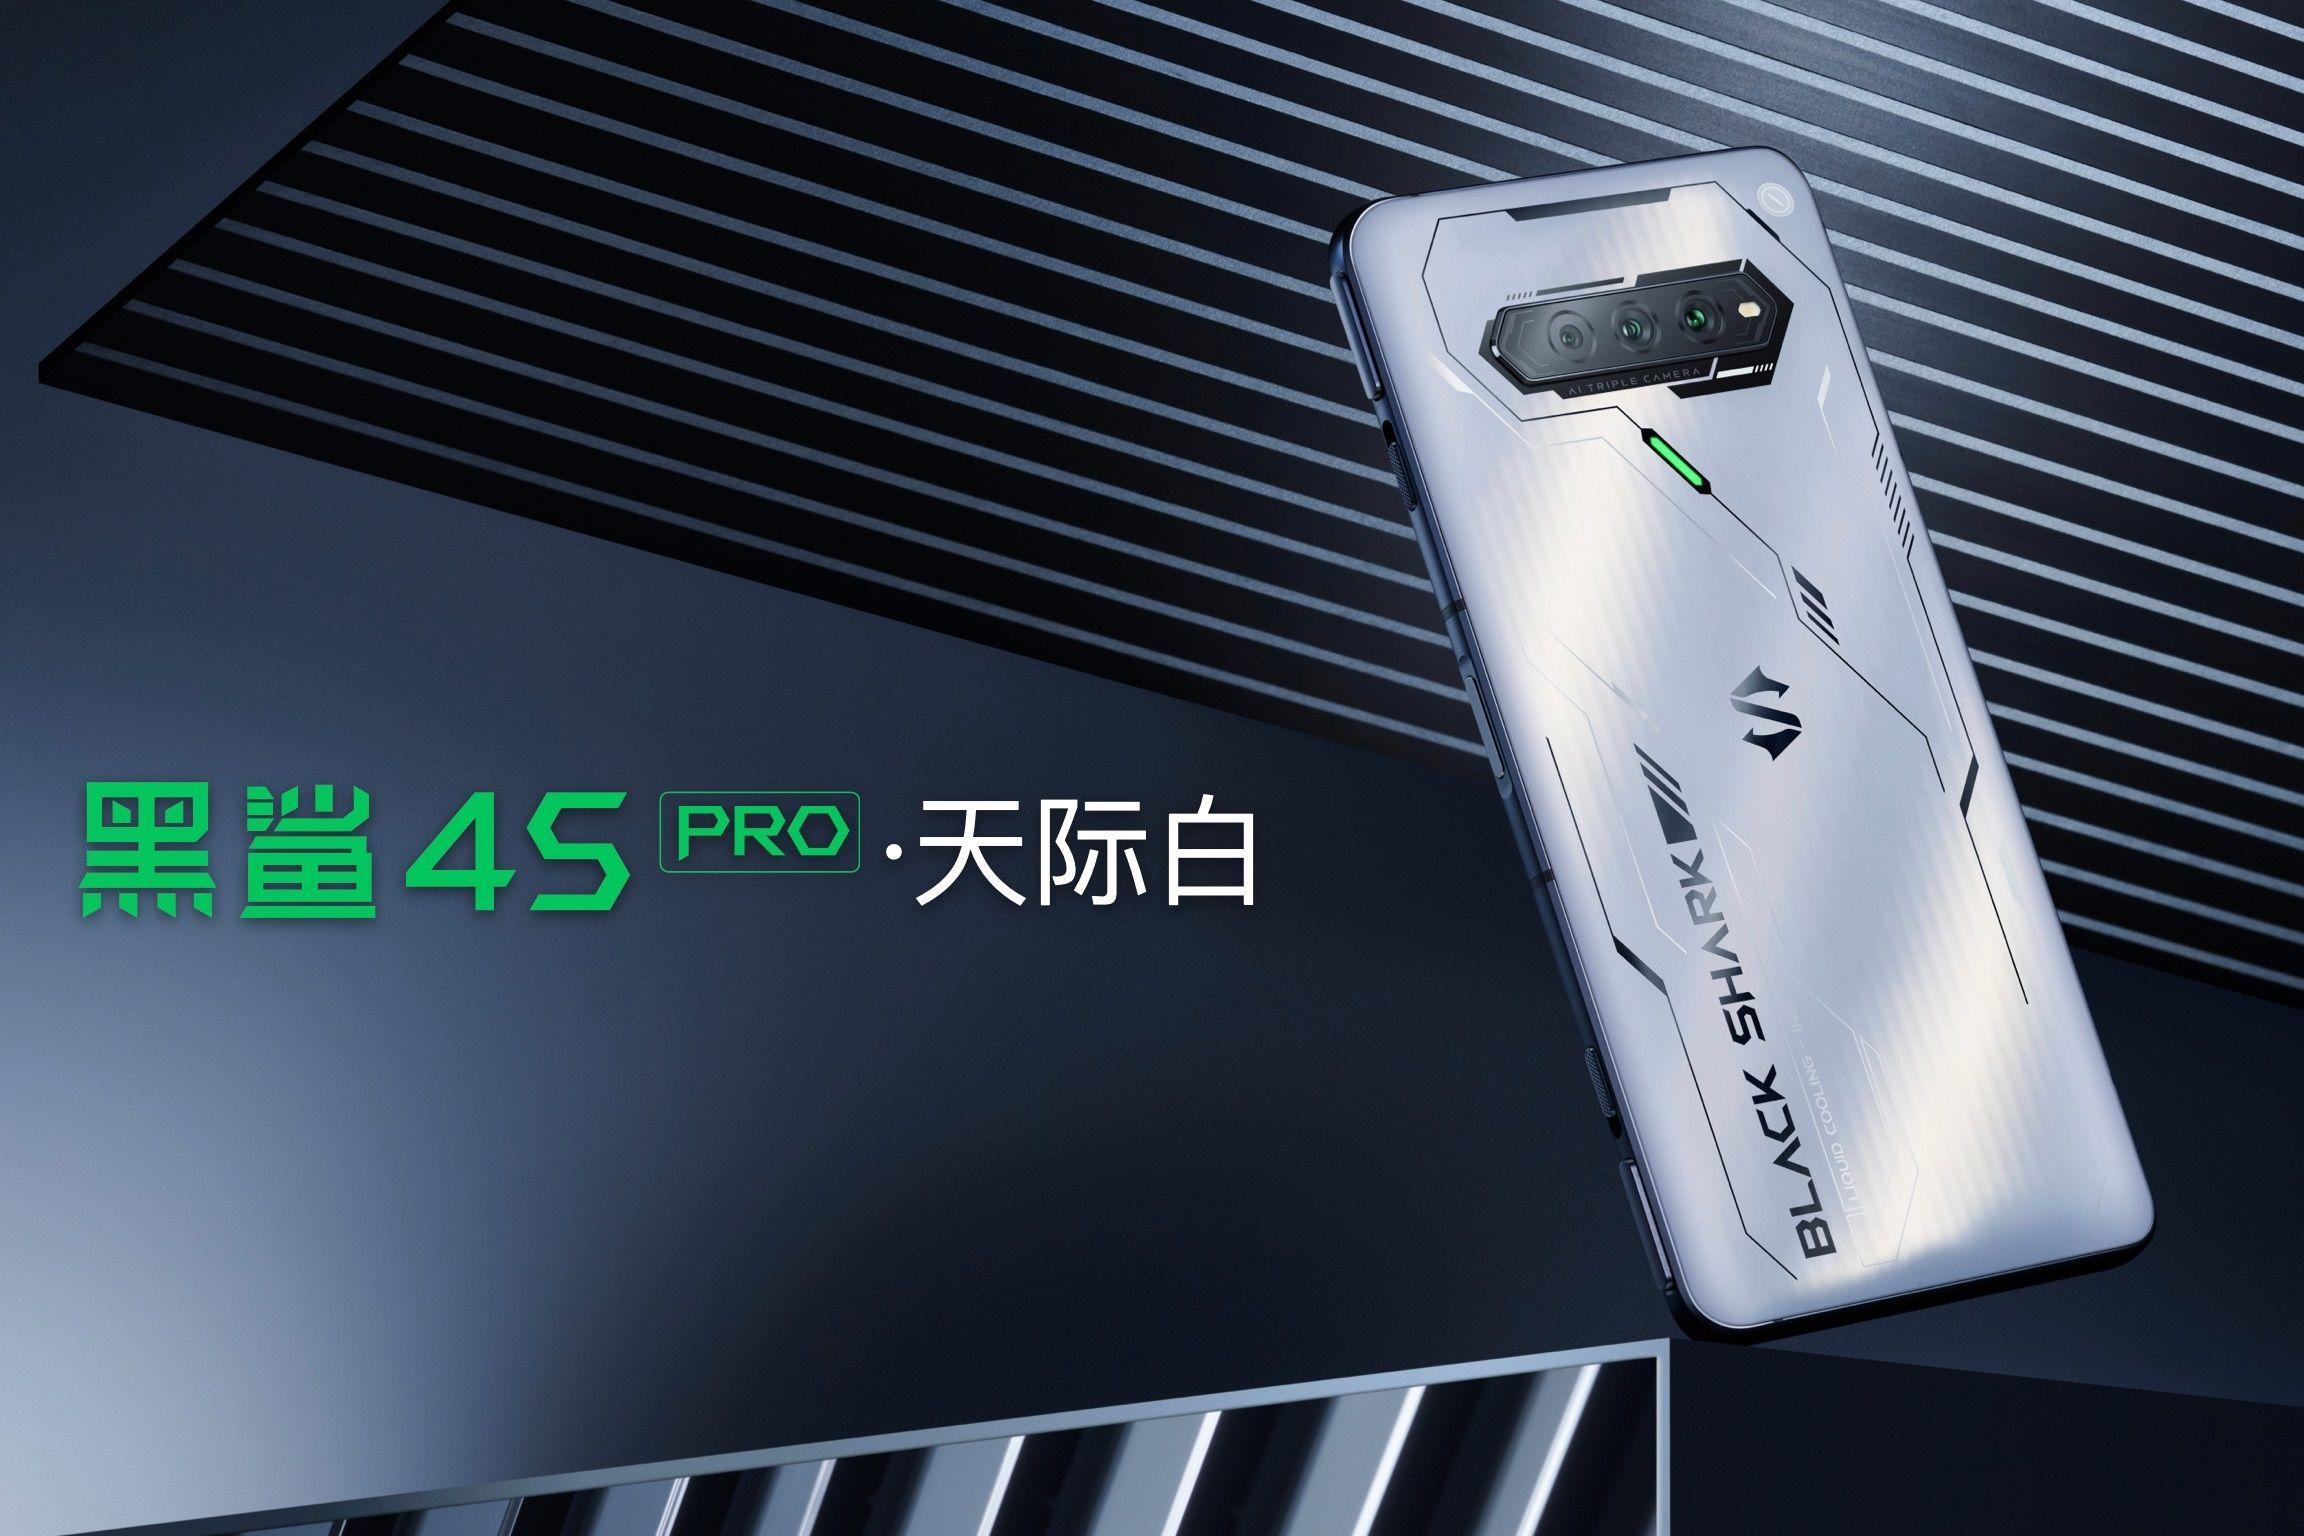 Black Shark 4S Pro